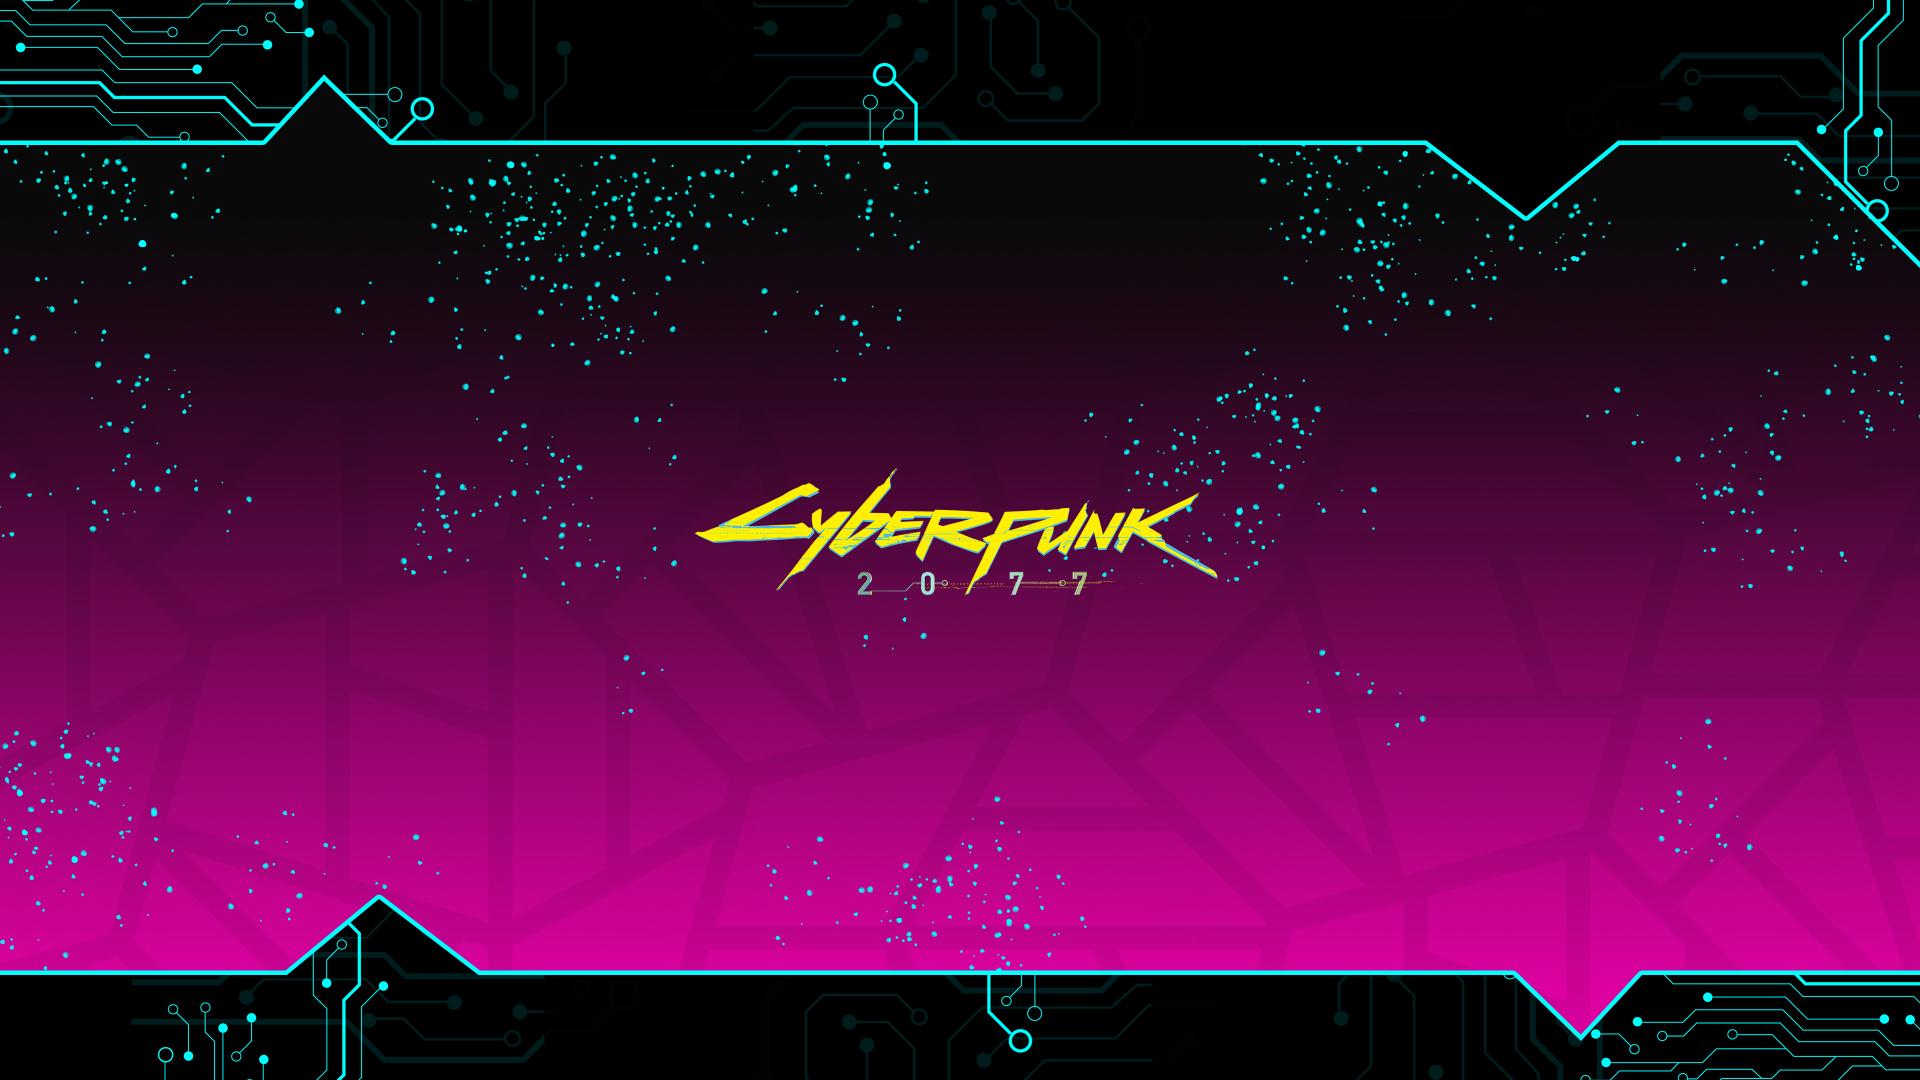 1920x1080 Cyberpunk 2077 Background Logo 1080P Laptop Full ...